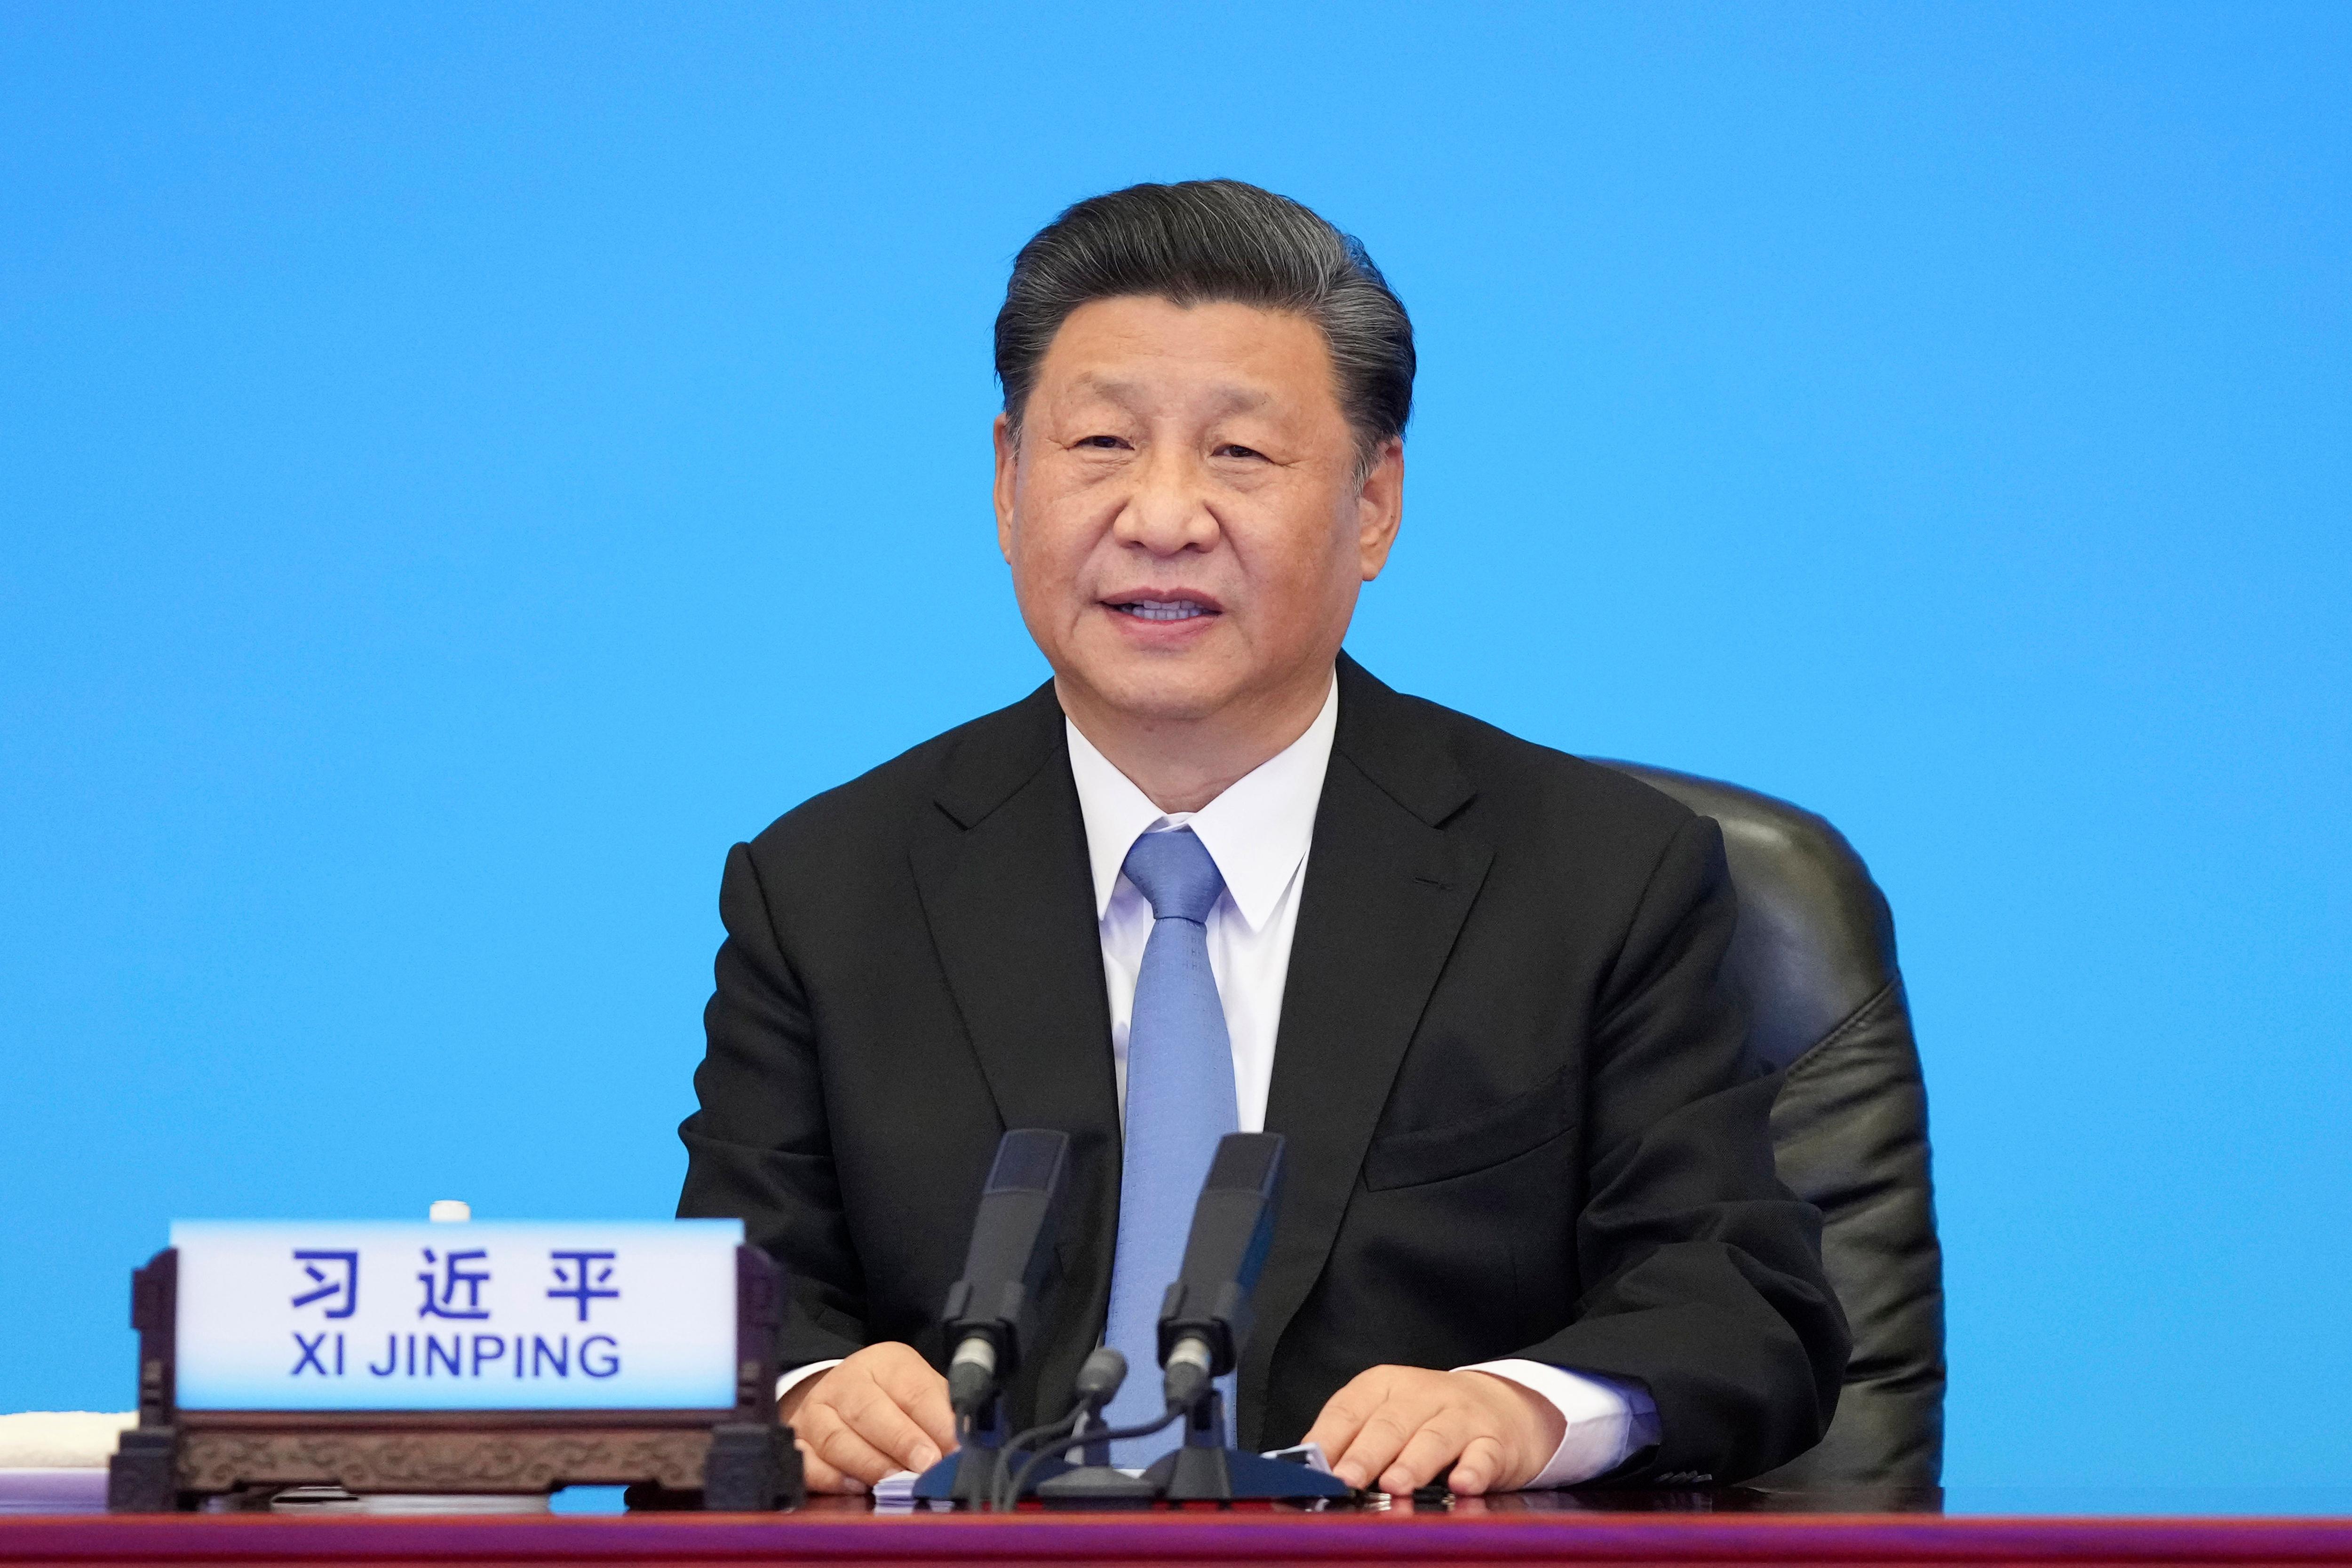 El presidente chino, Xi Jinping, amplía su arsenal nuclear